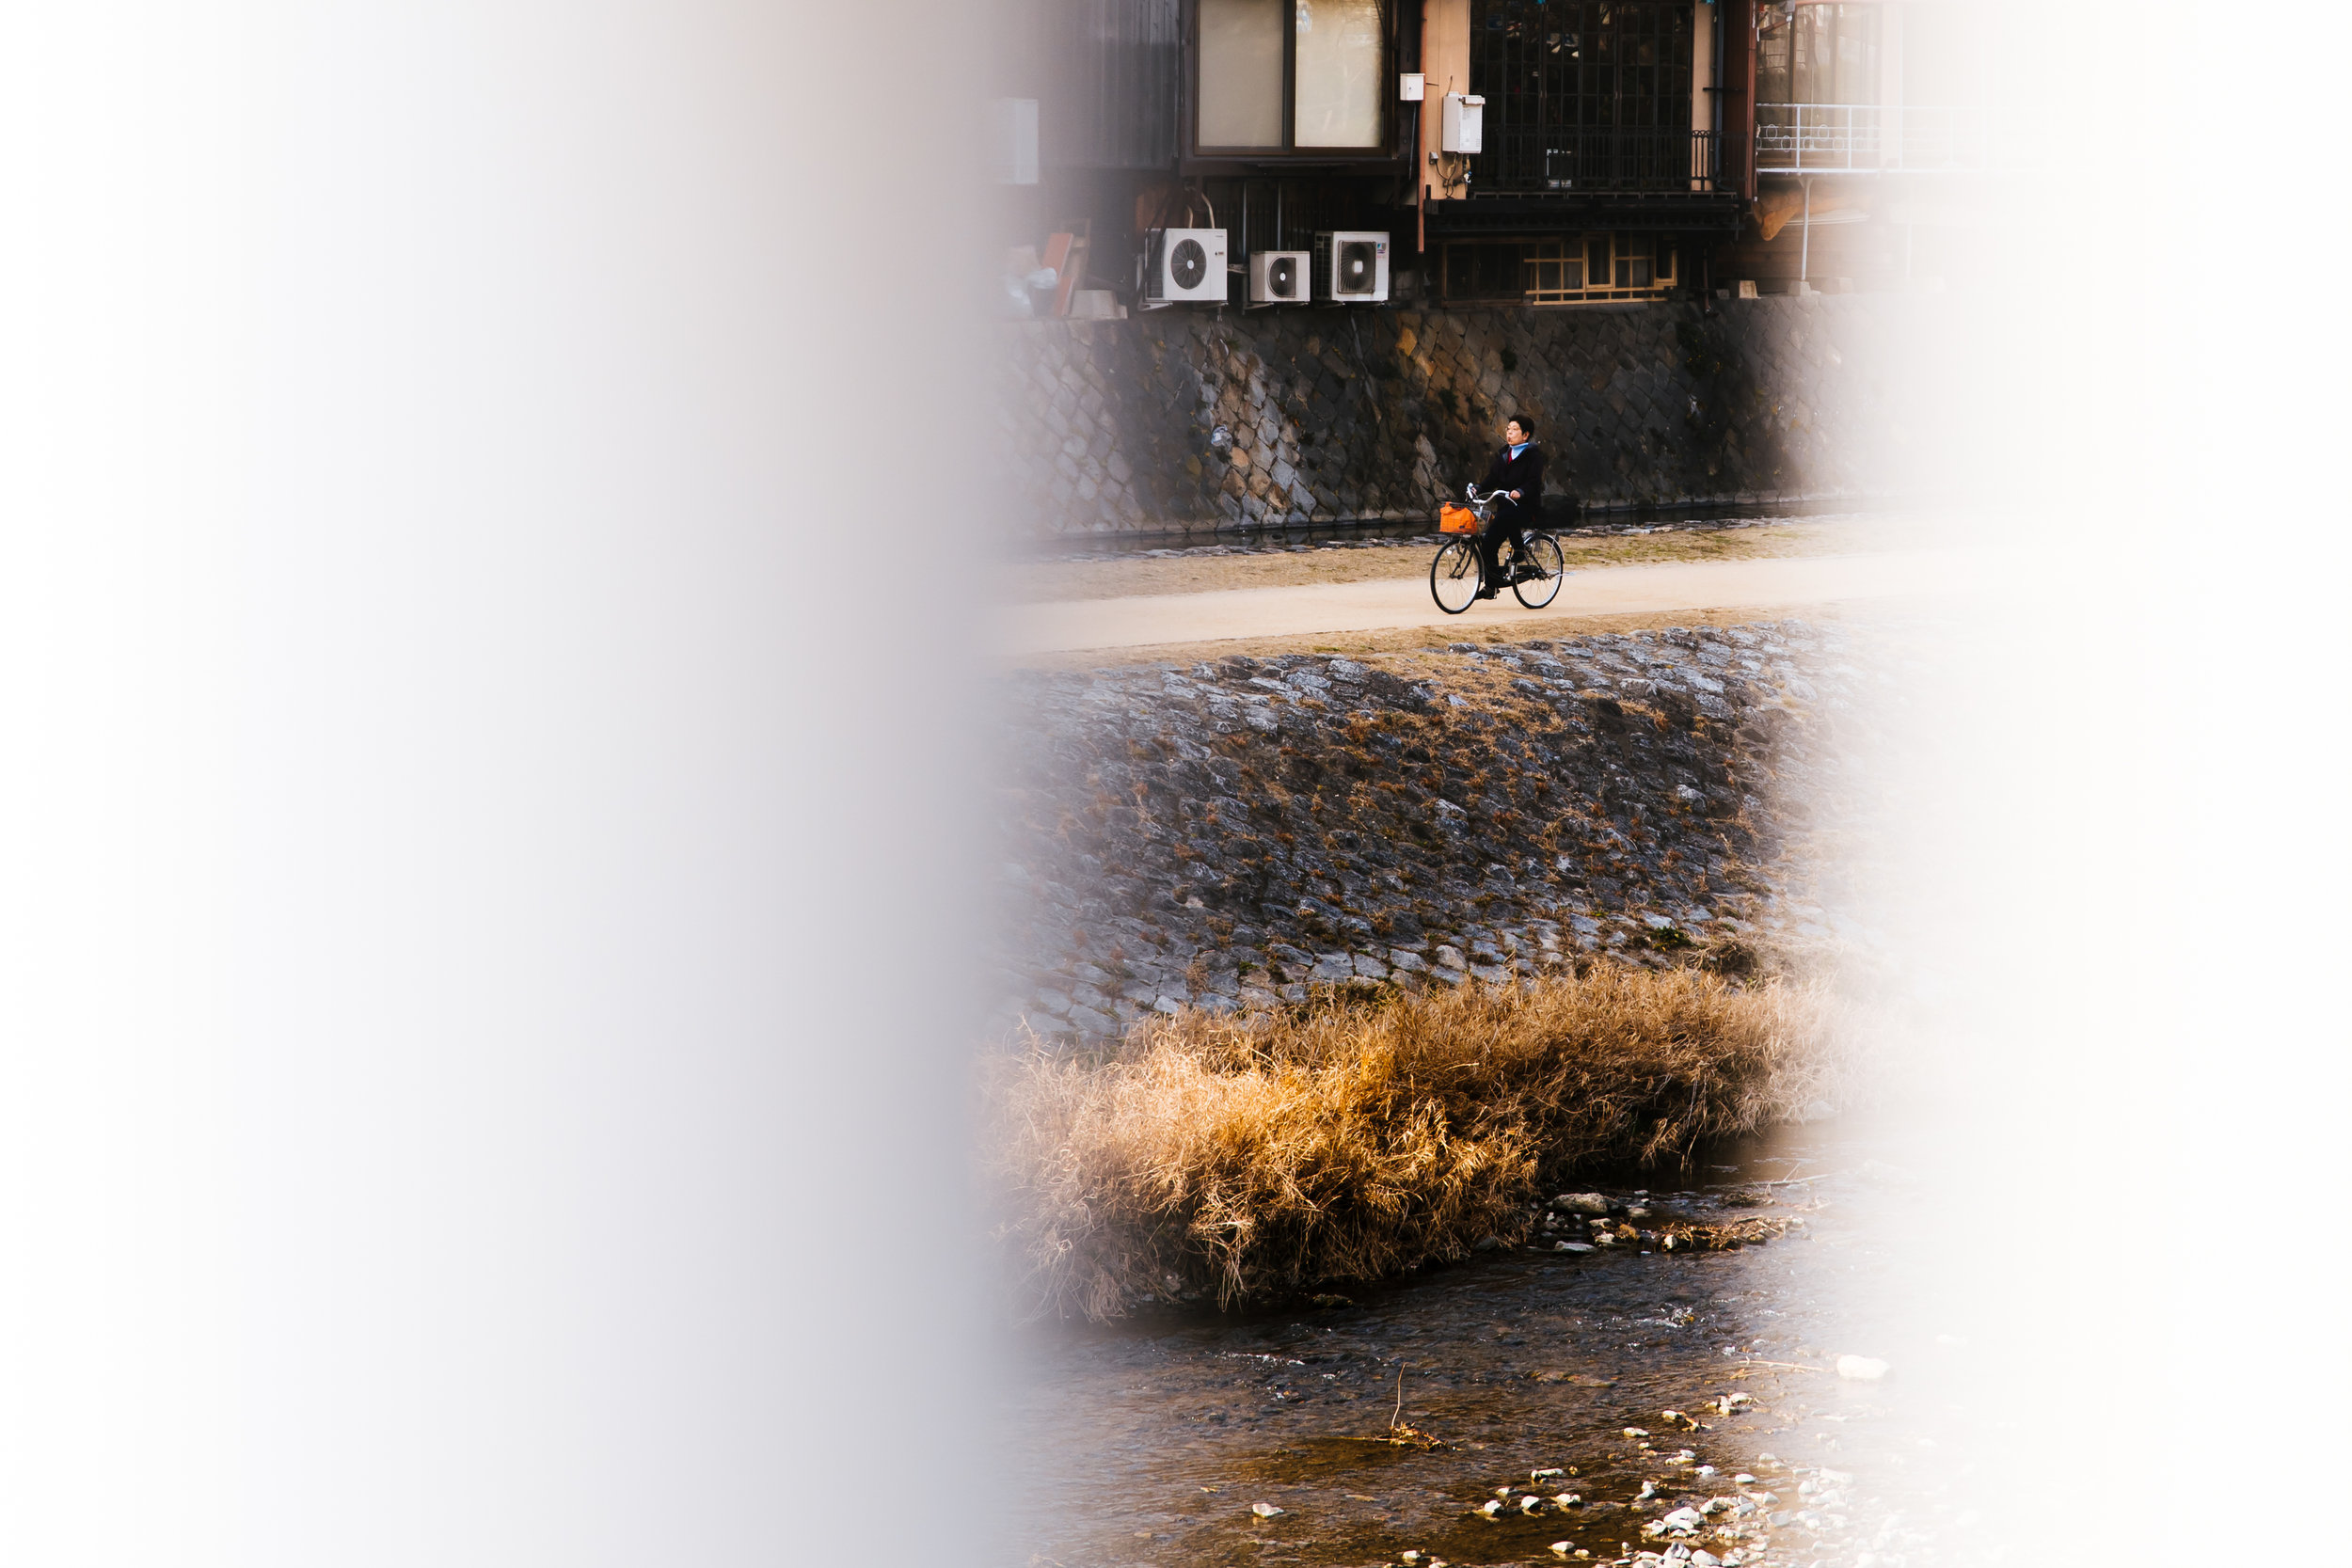 bike-rider.jpg